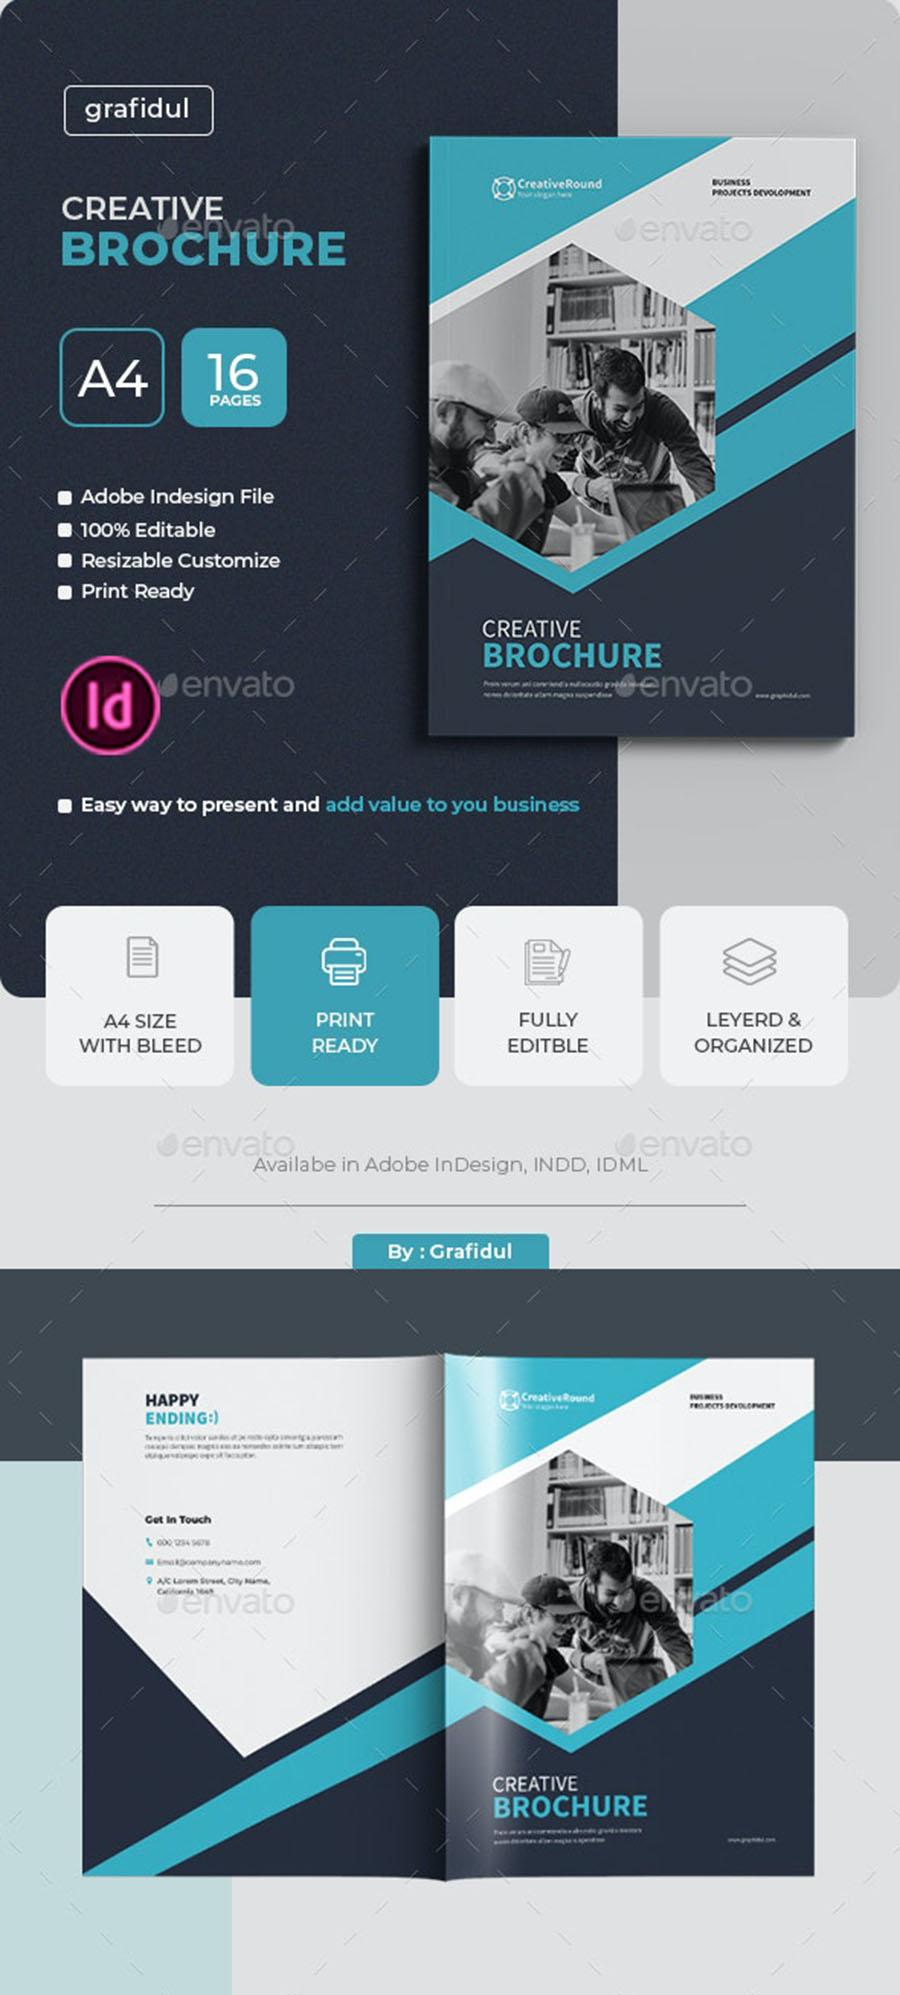 Creative Brochure InDesign Template